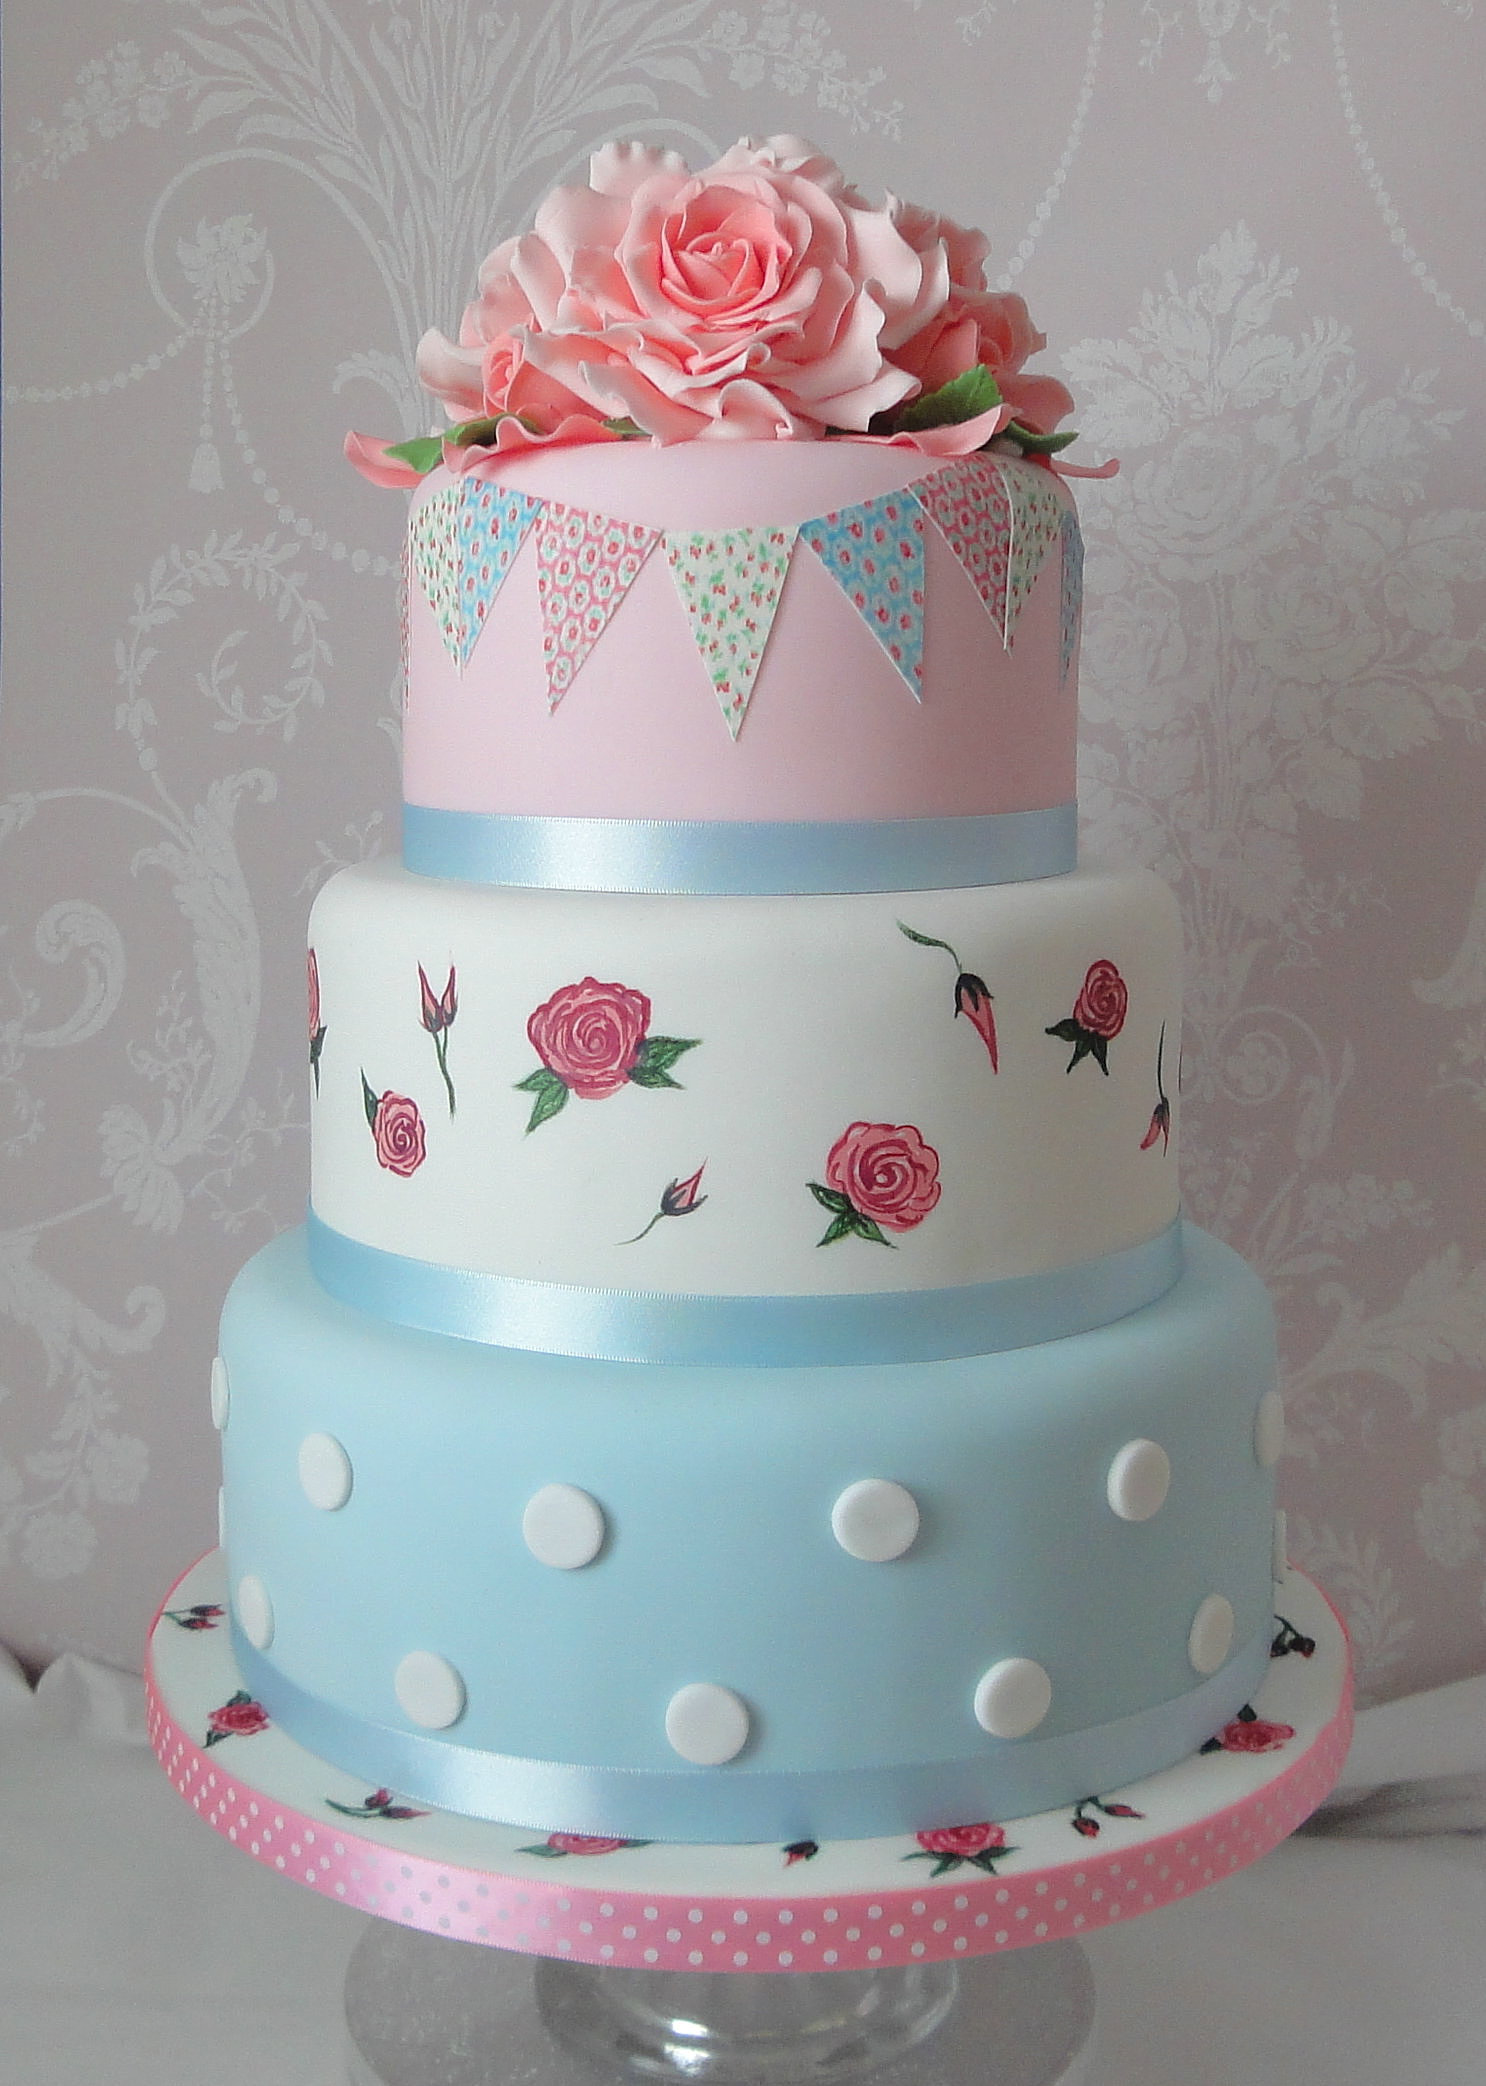 Happy Birthday Cath Cake